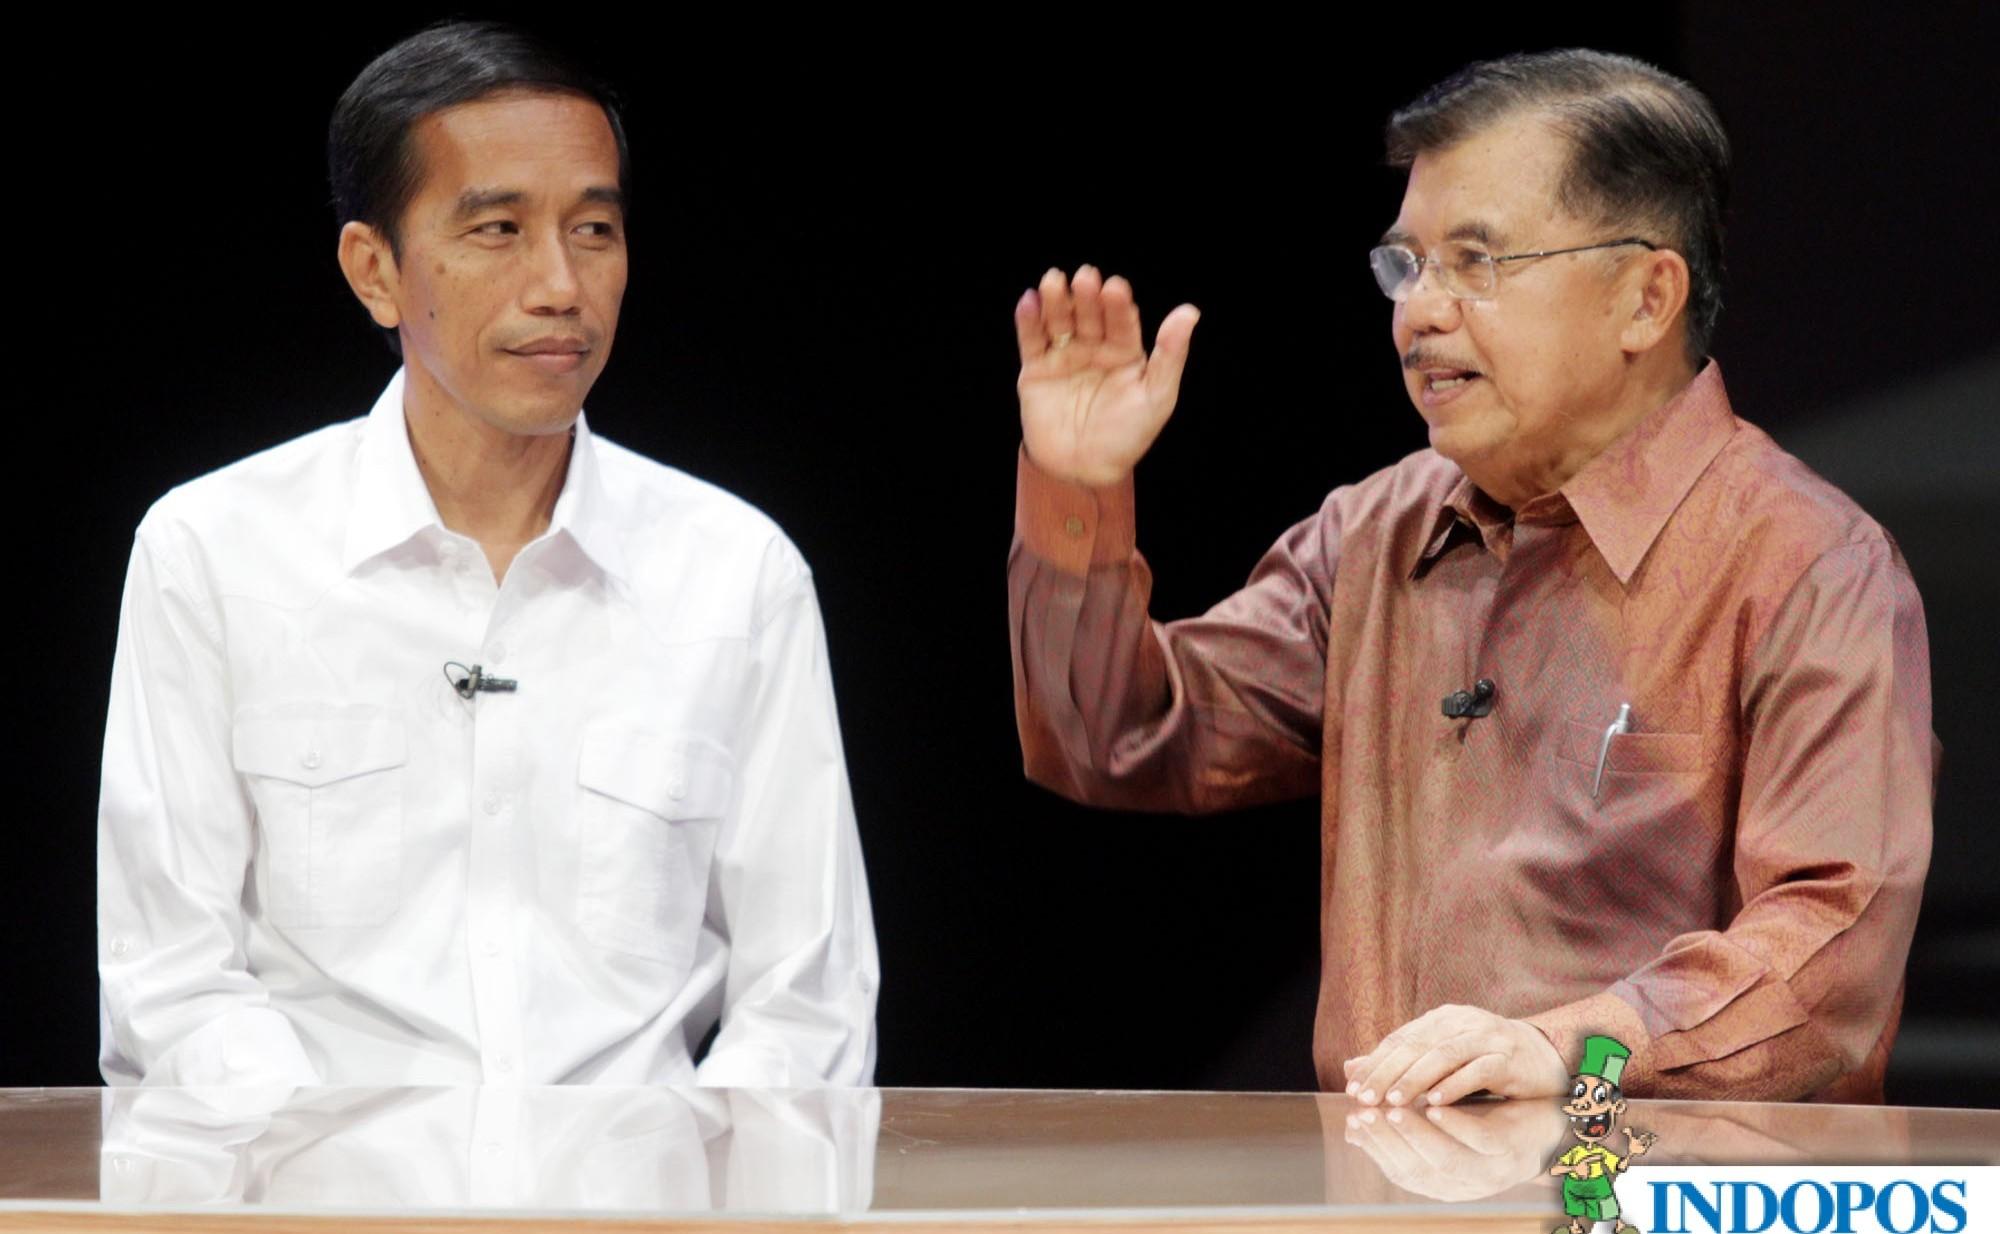 Profesor Politik LIPI Ini Sebut Pemerintahan Jokowi Tidak Akan Lama